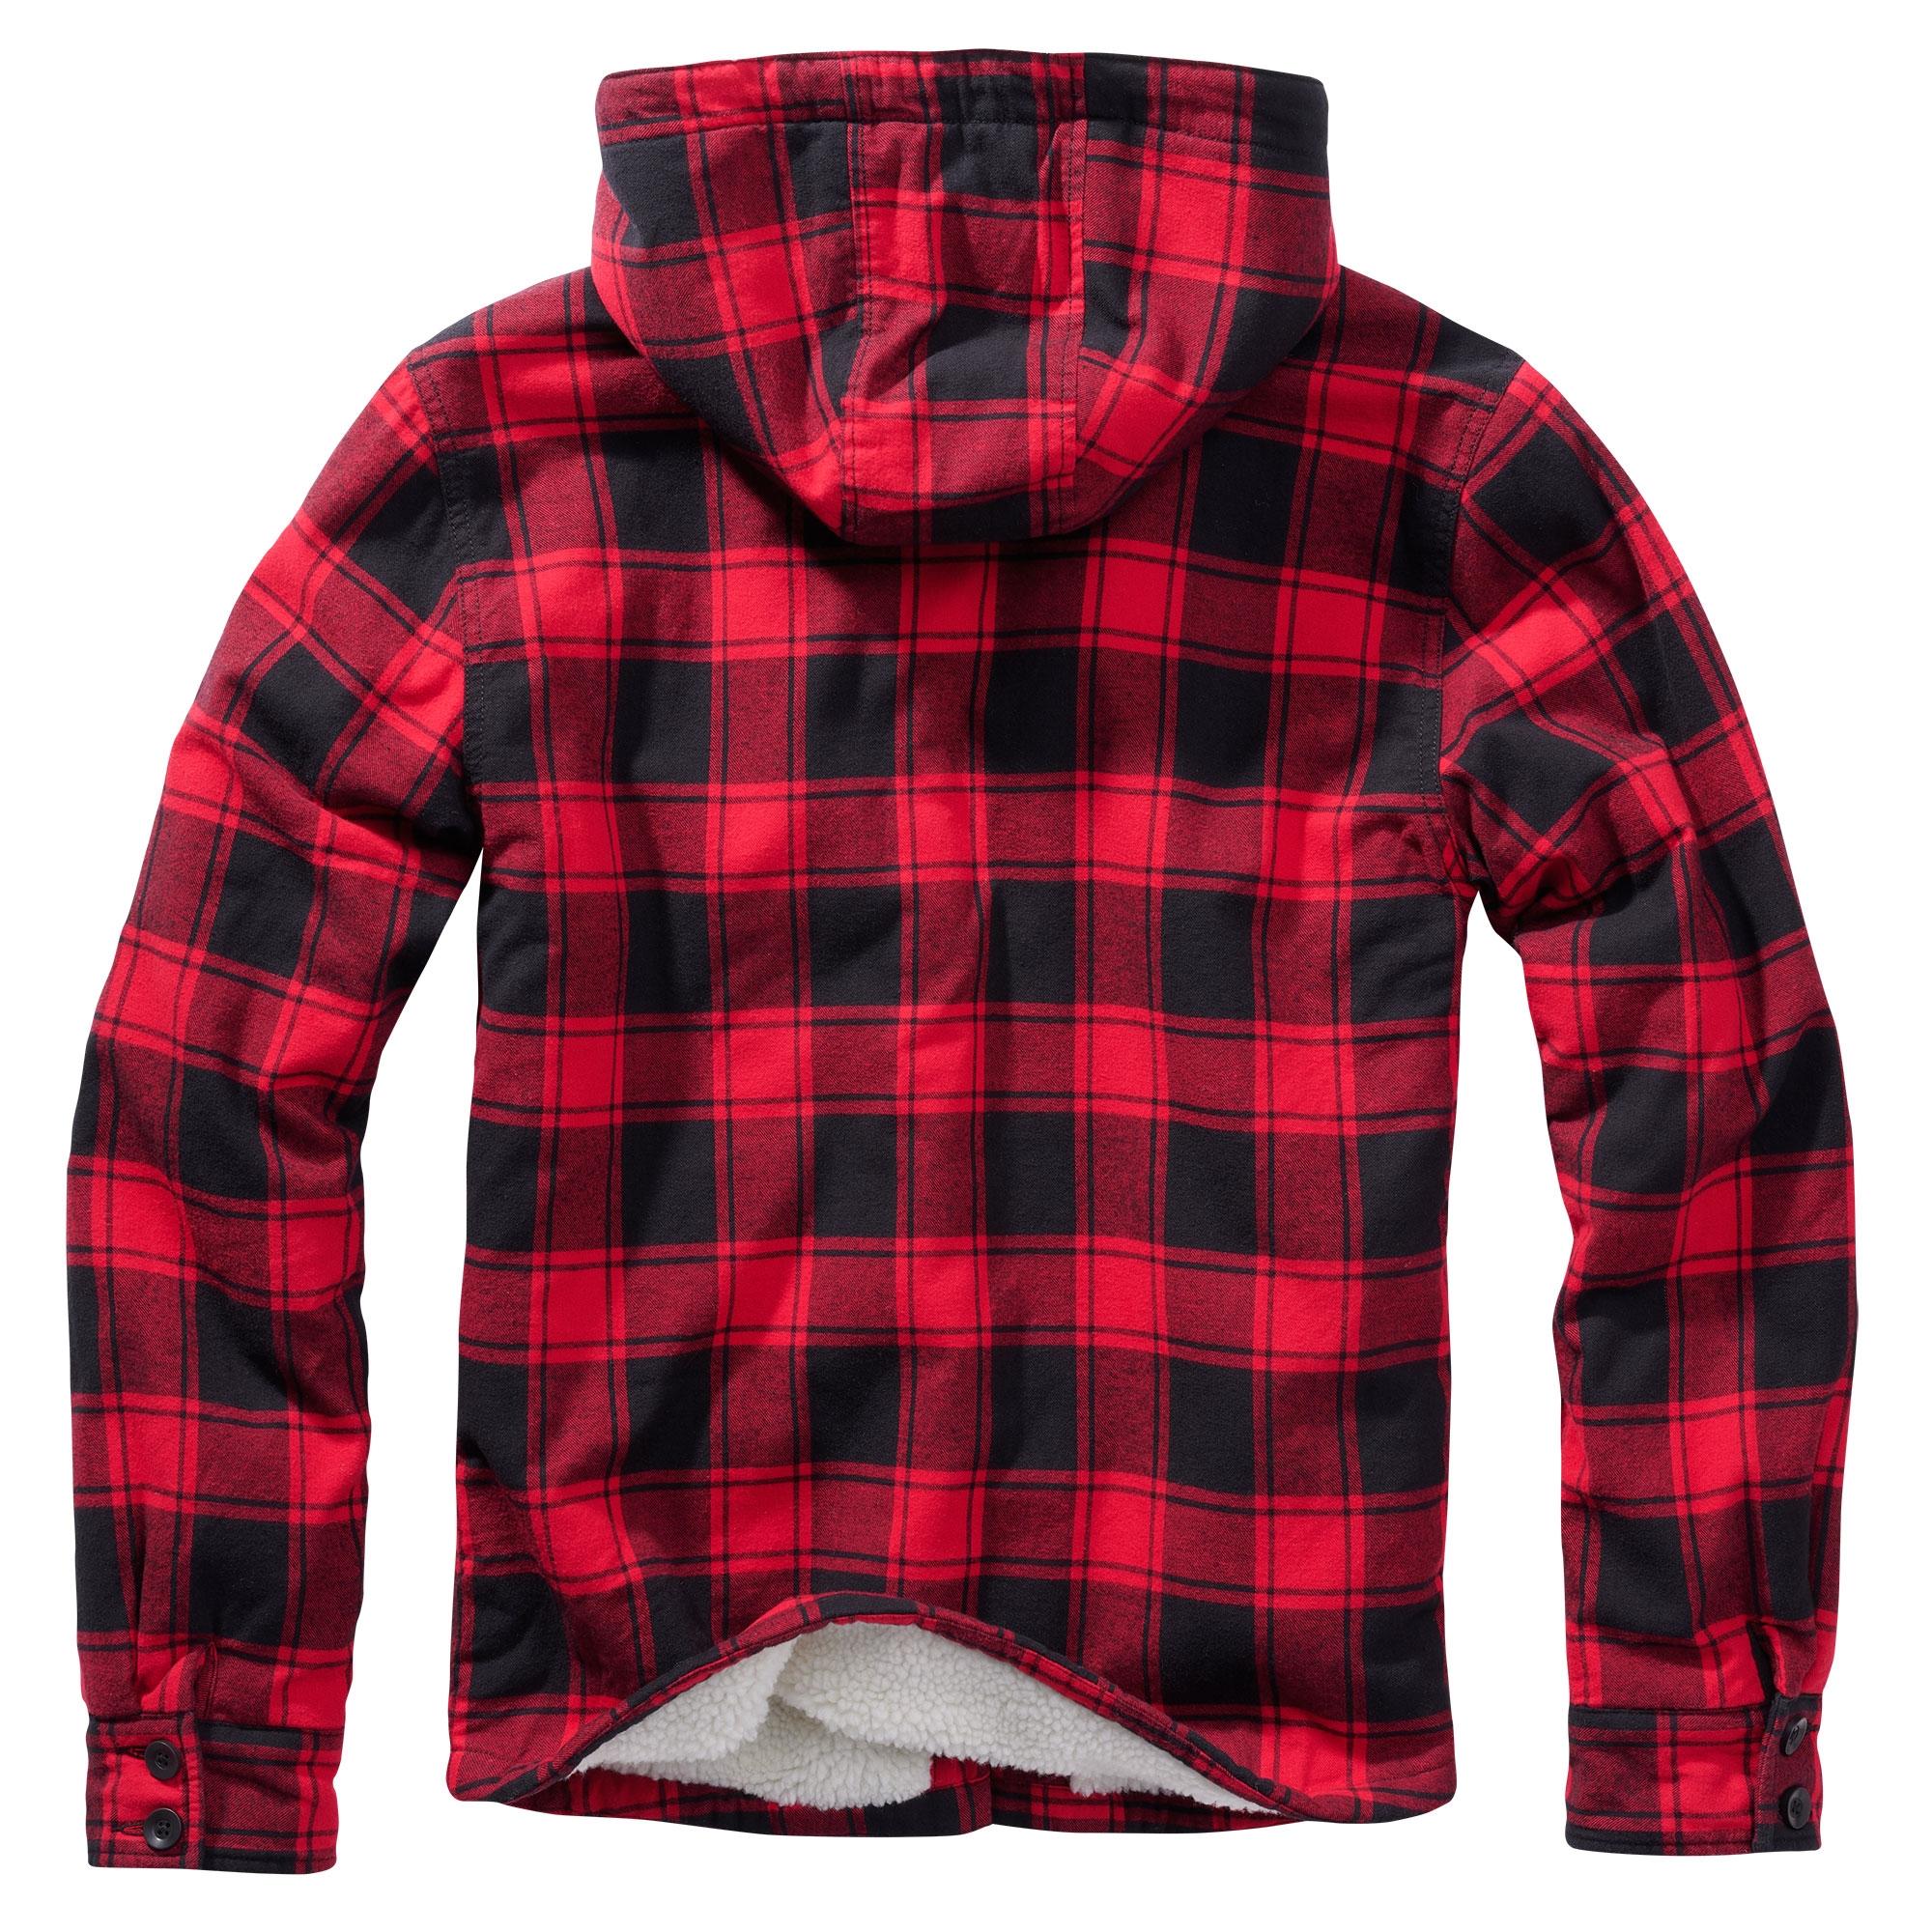 Brandit-Lumberjack-Kapuzen-Jacke-gefuettert-Holzfaellerhemd-Winterjacke-S-5XL Indexbild 7